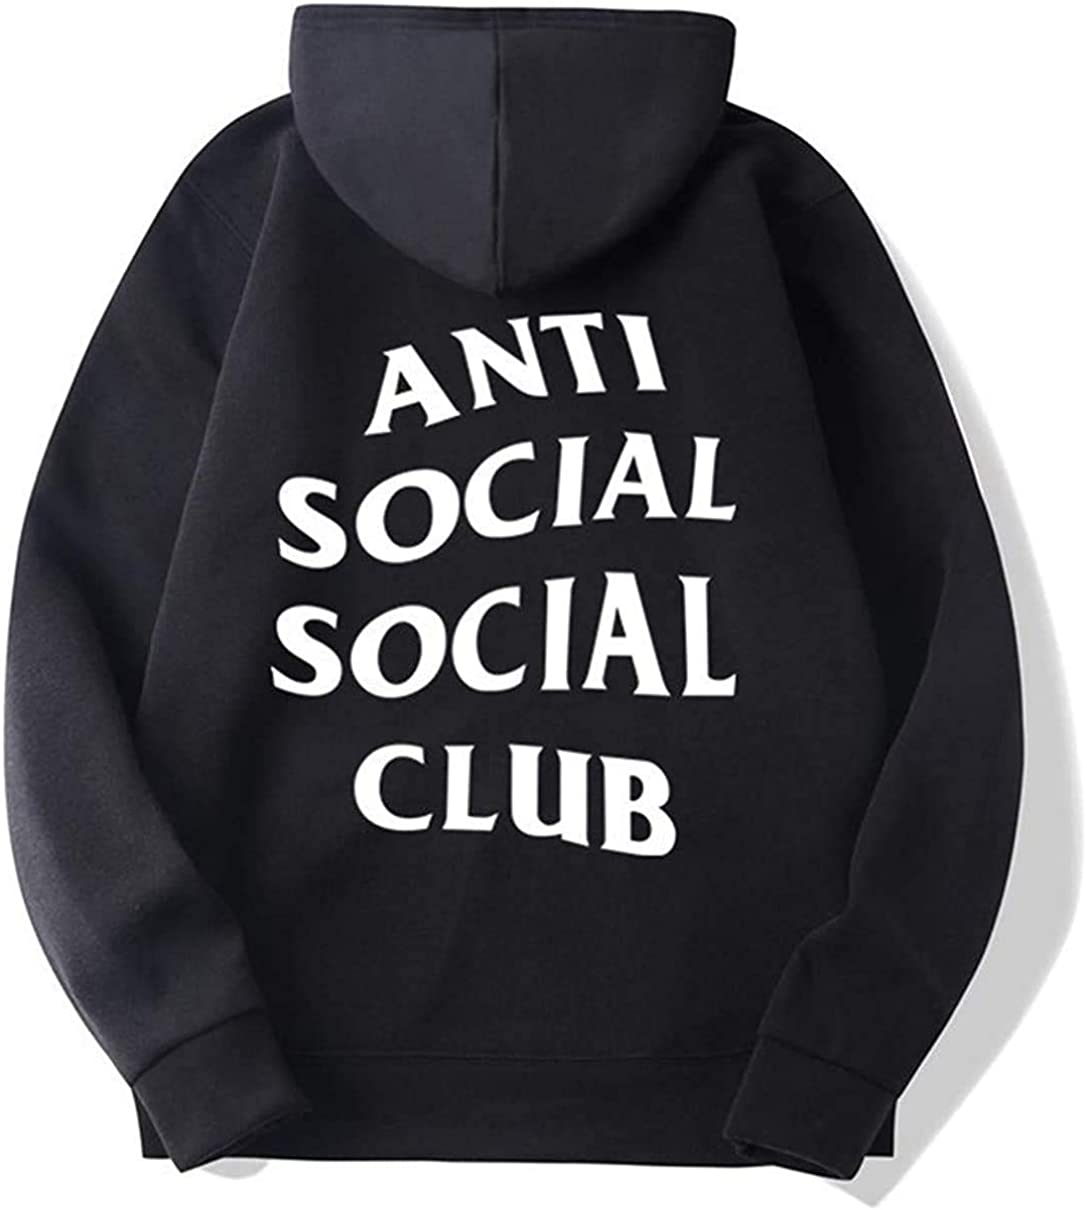 XINGENG Felpe con Cappuccio Pullover a Maniche Lunghe Anti Social Social Club